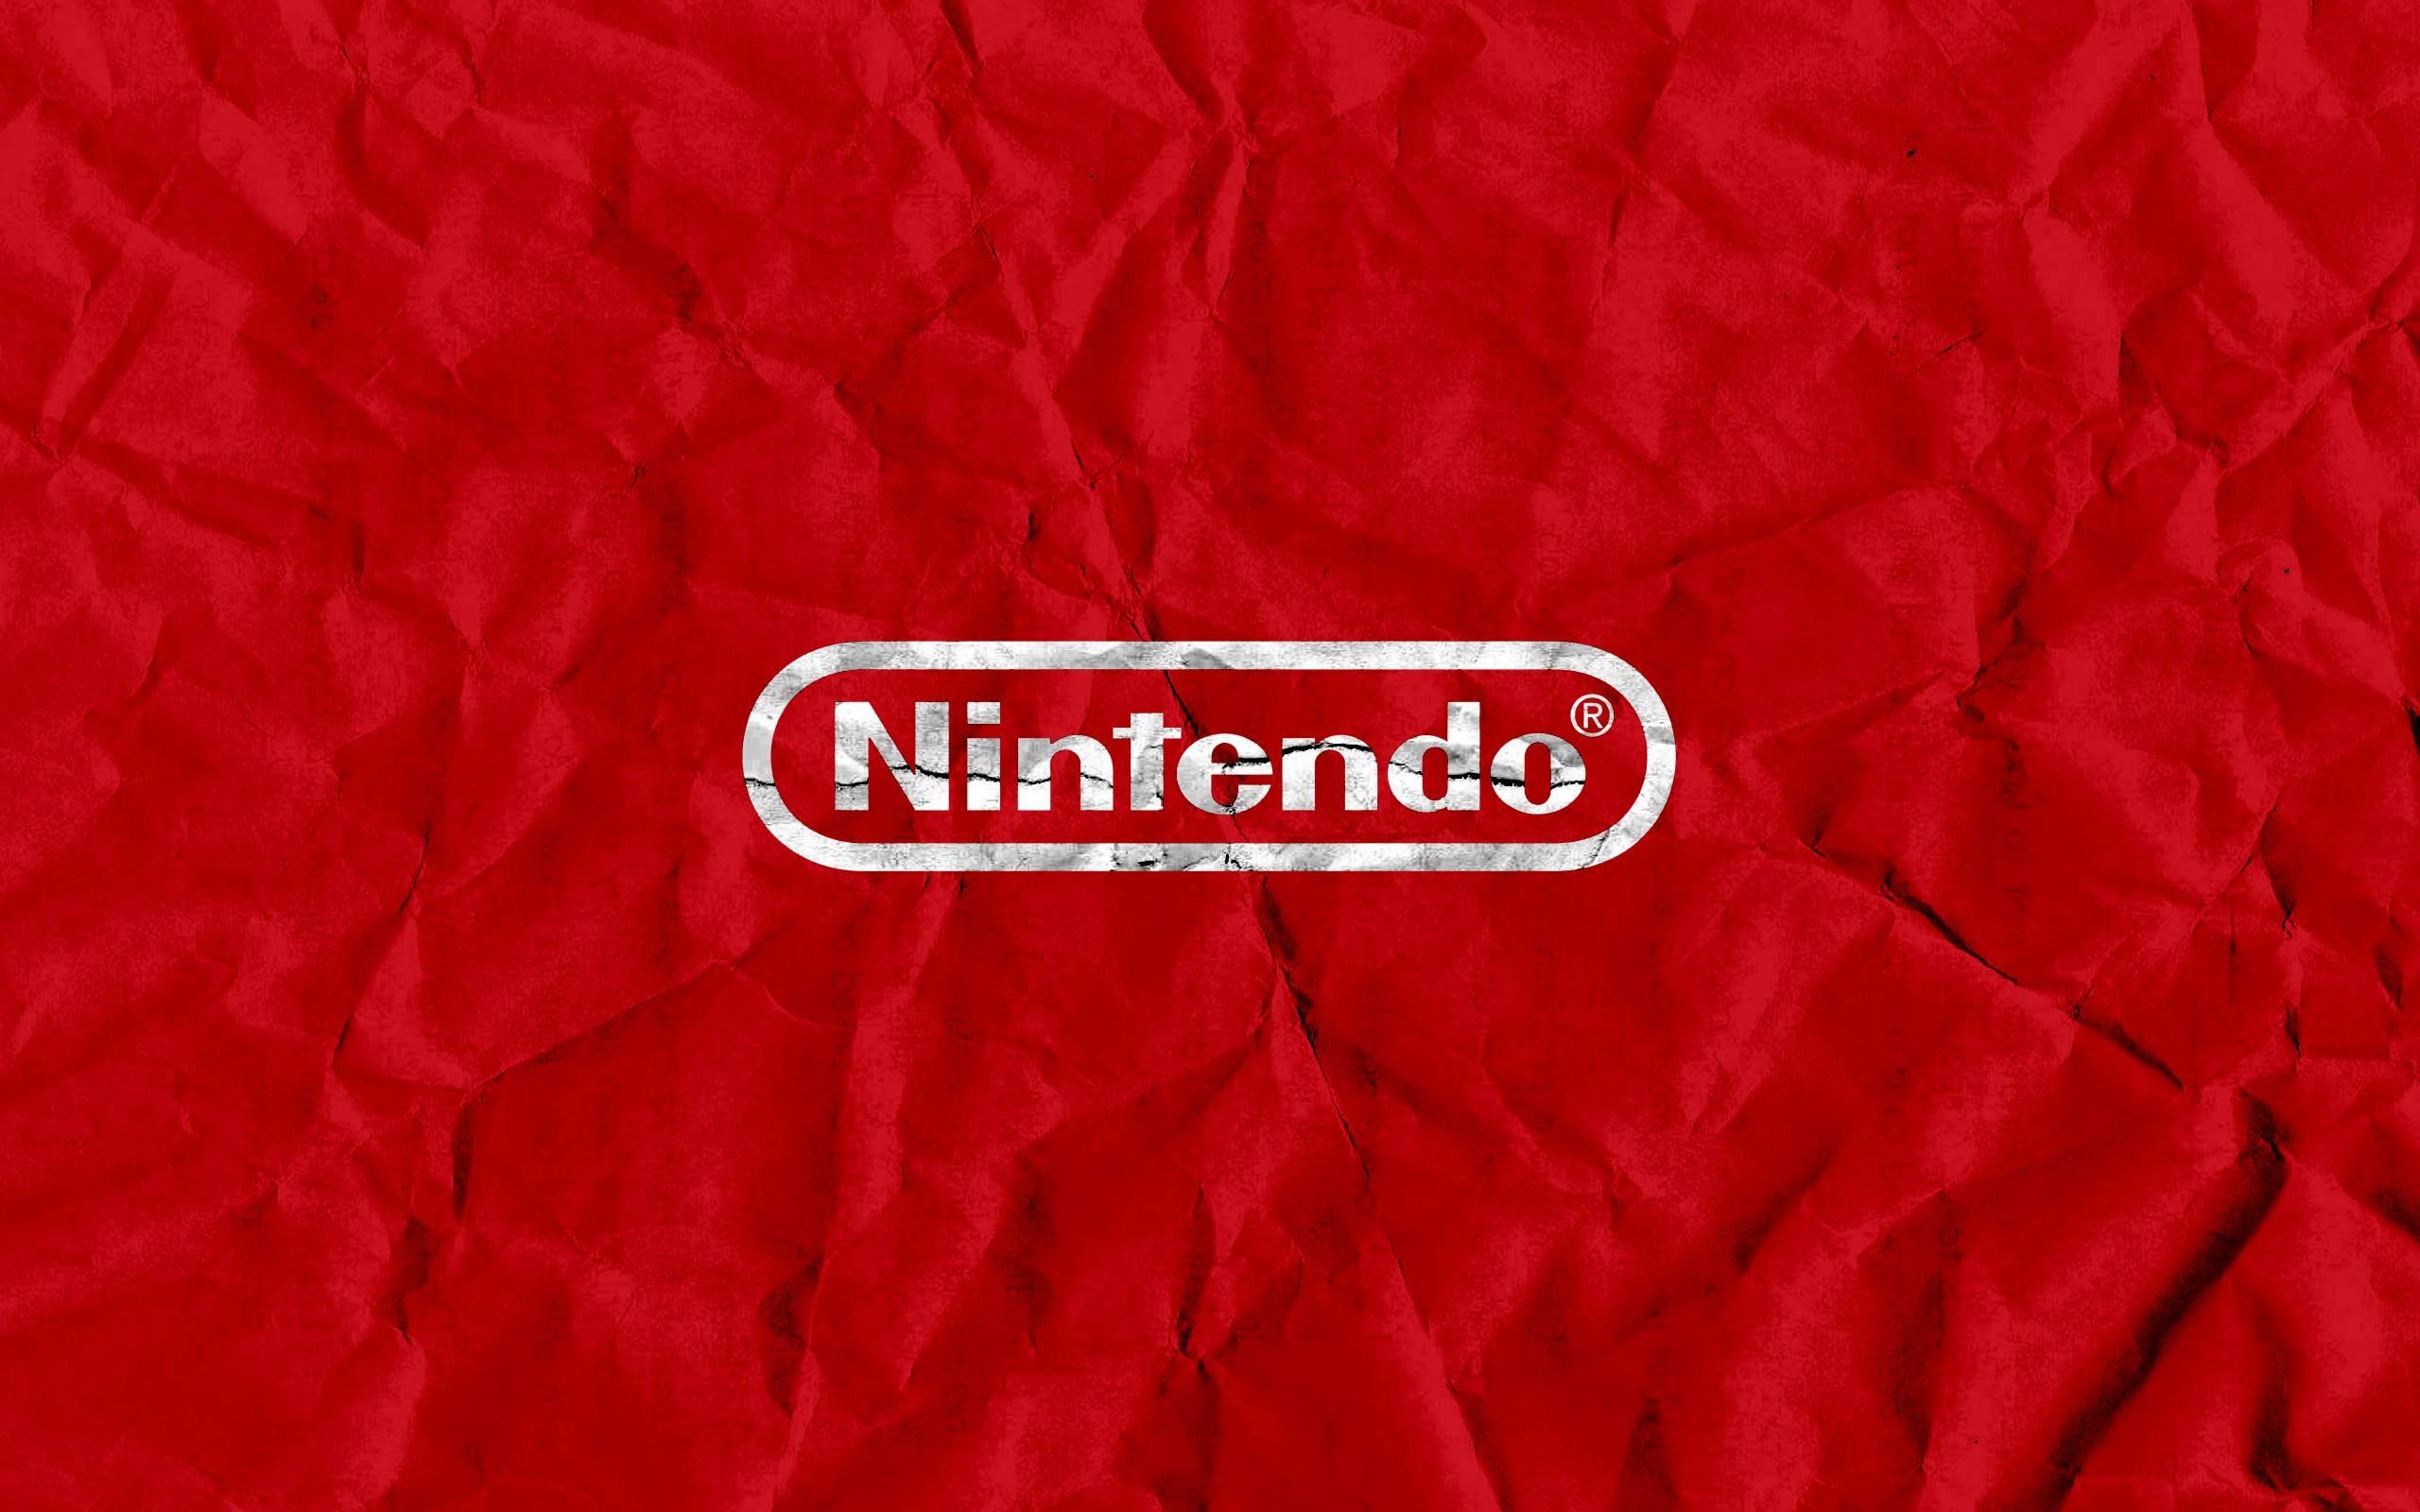 Nintendo Logo Wallpaper High Quality Resolution On Wallpaper Hd 2560 x 1600  px 1.2 MB 1920×1080